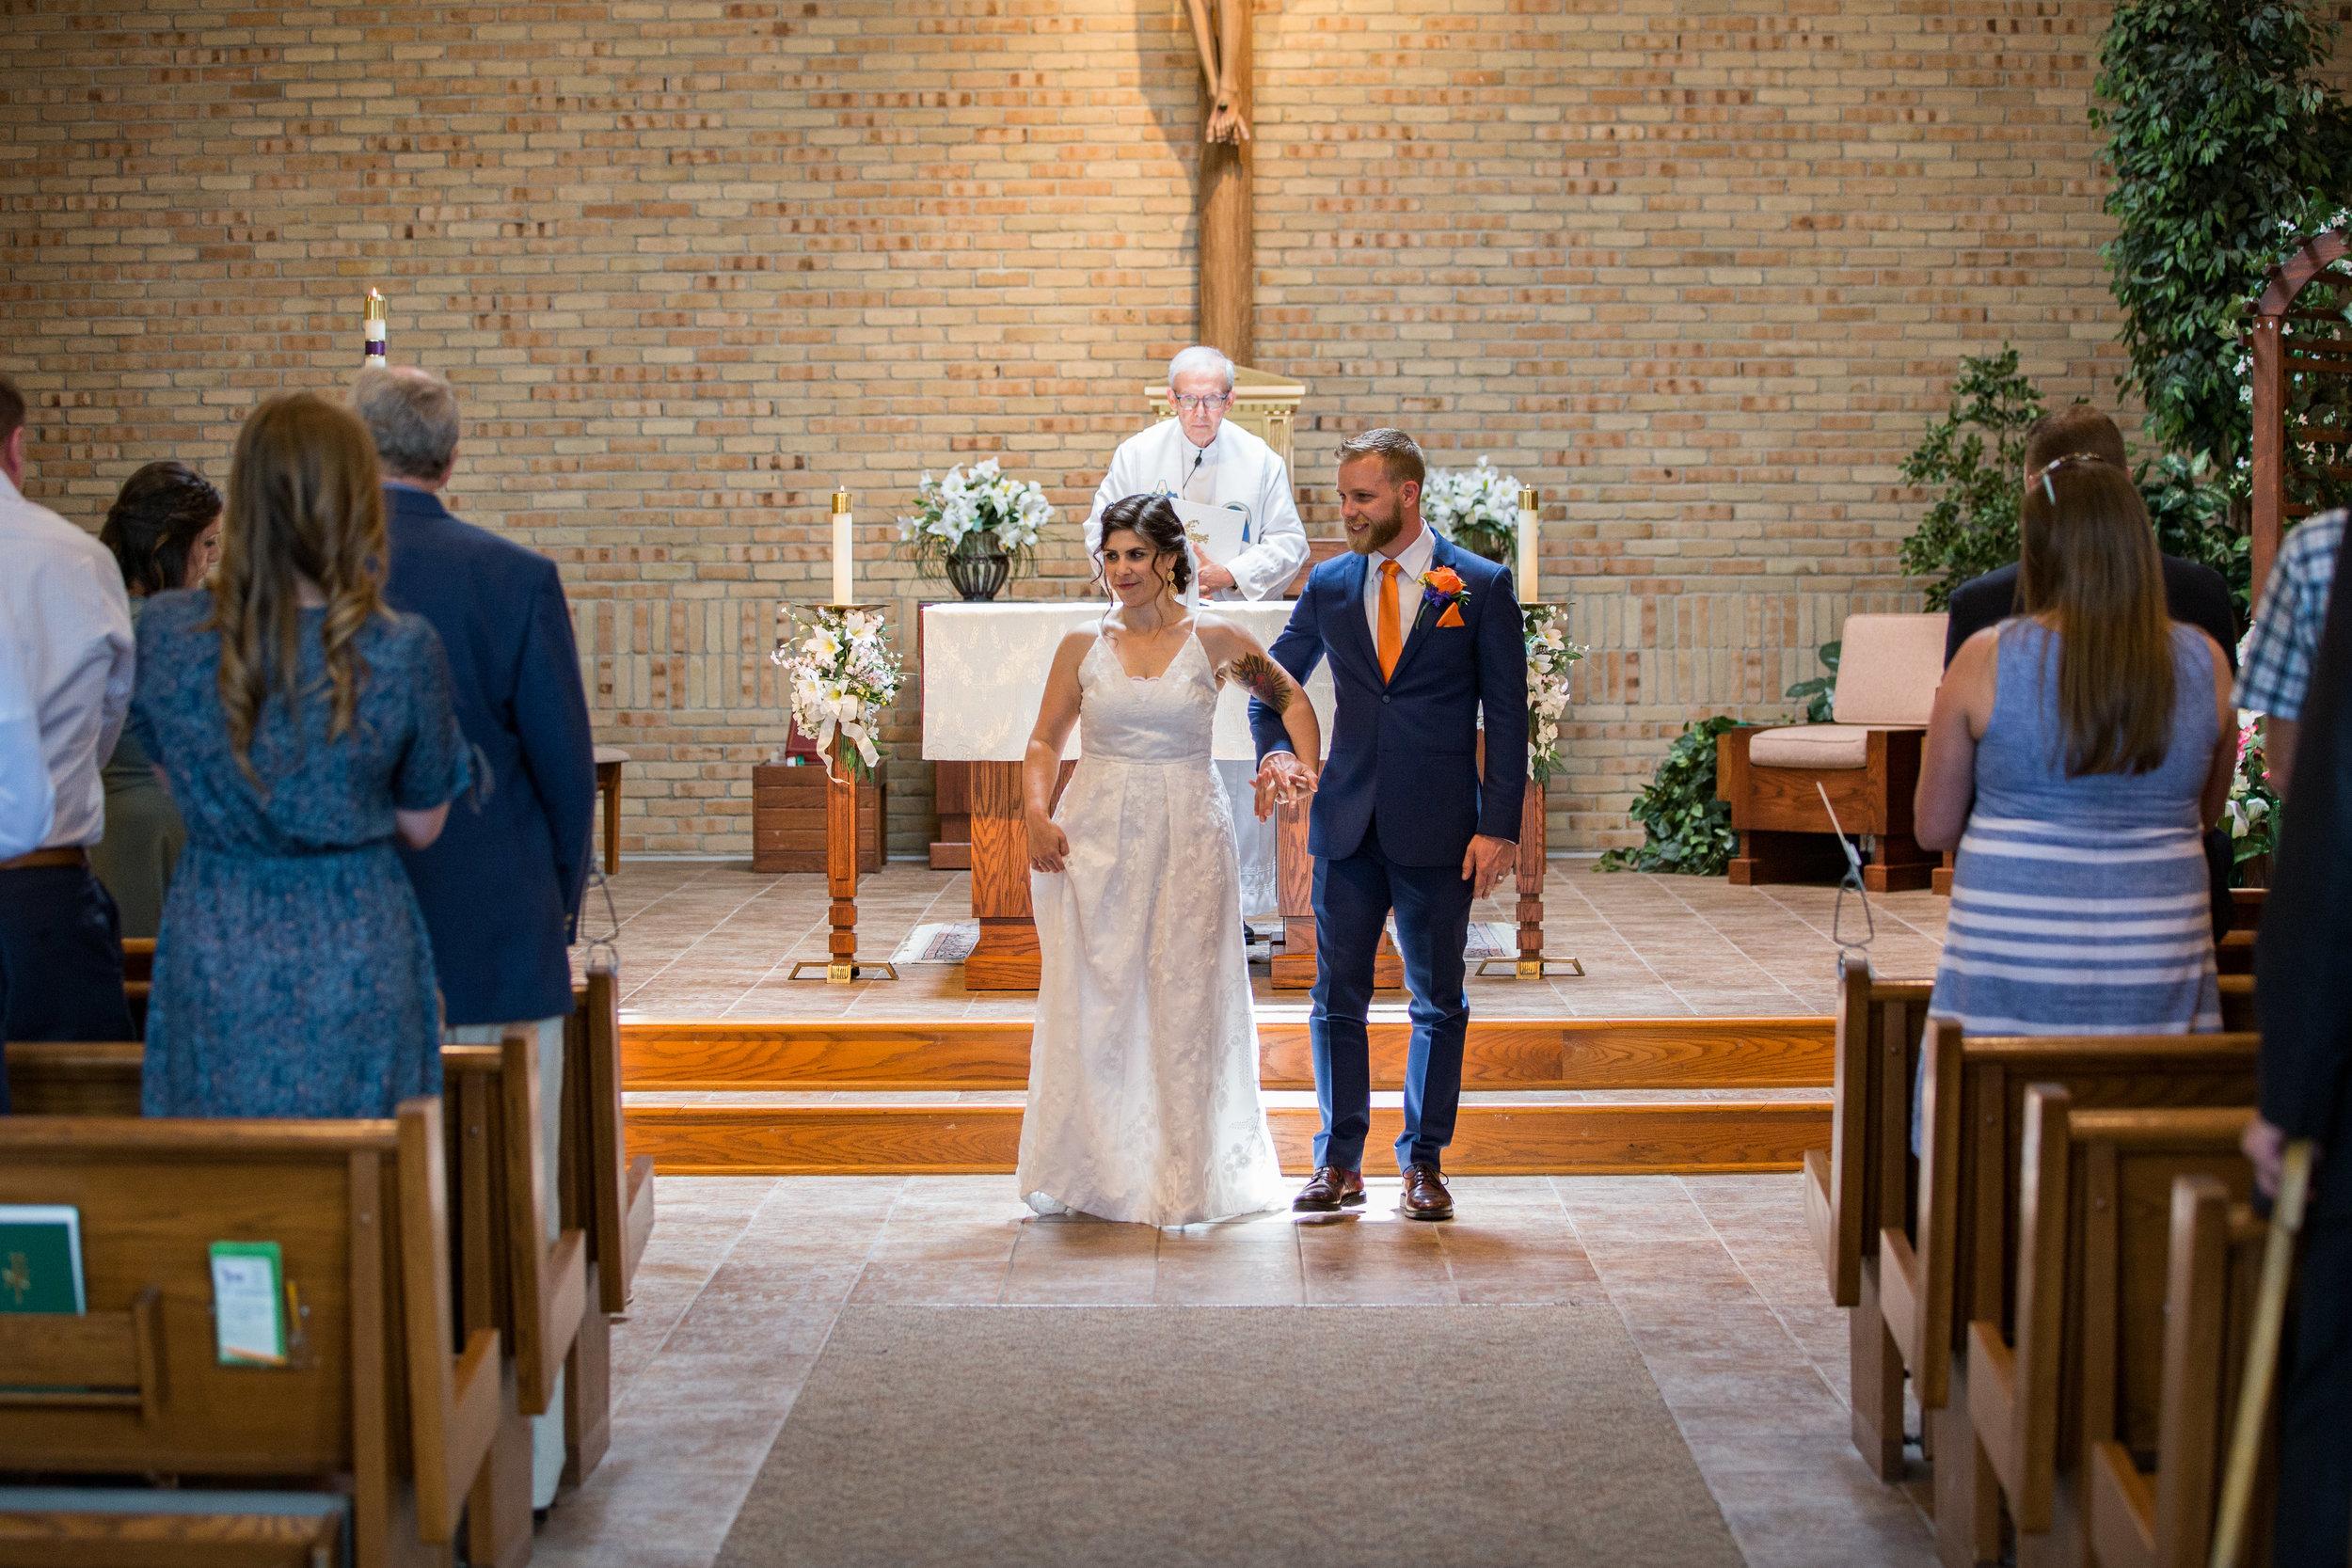 Natalie and Dallas Mooney Wedding 6-8-19_Tania Watt Photography-147.jpg